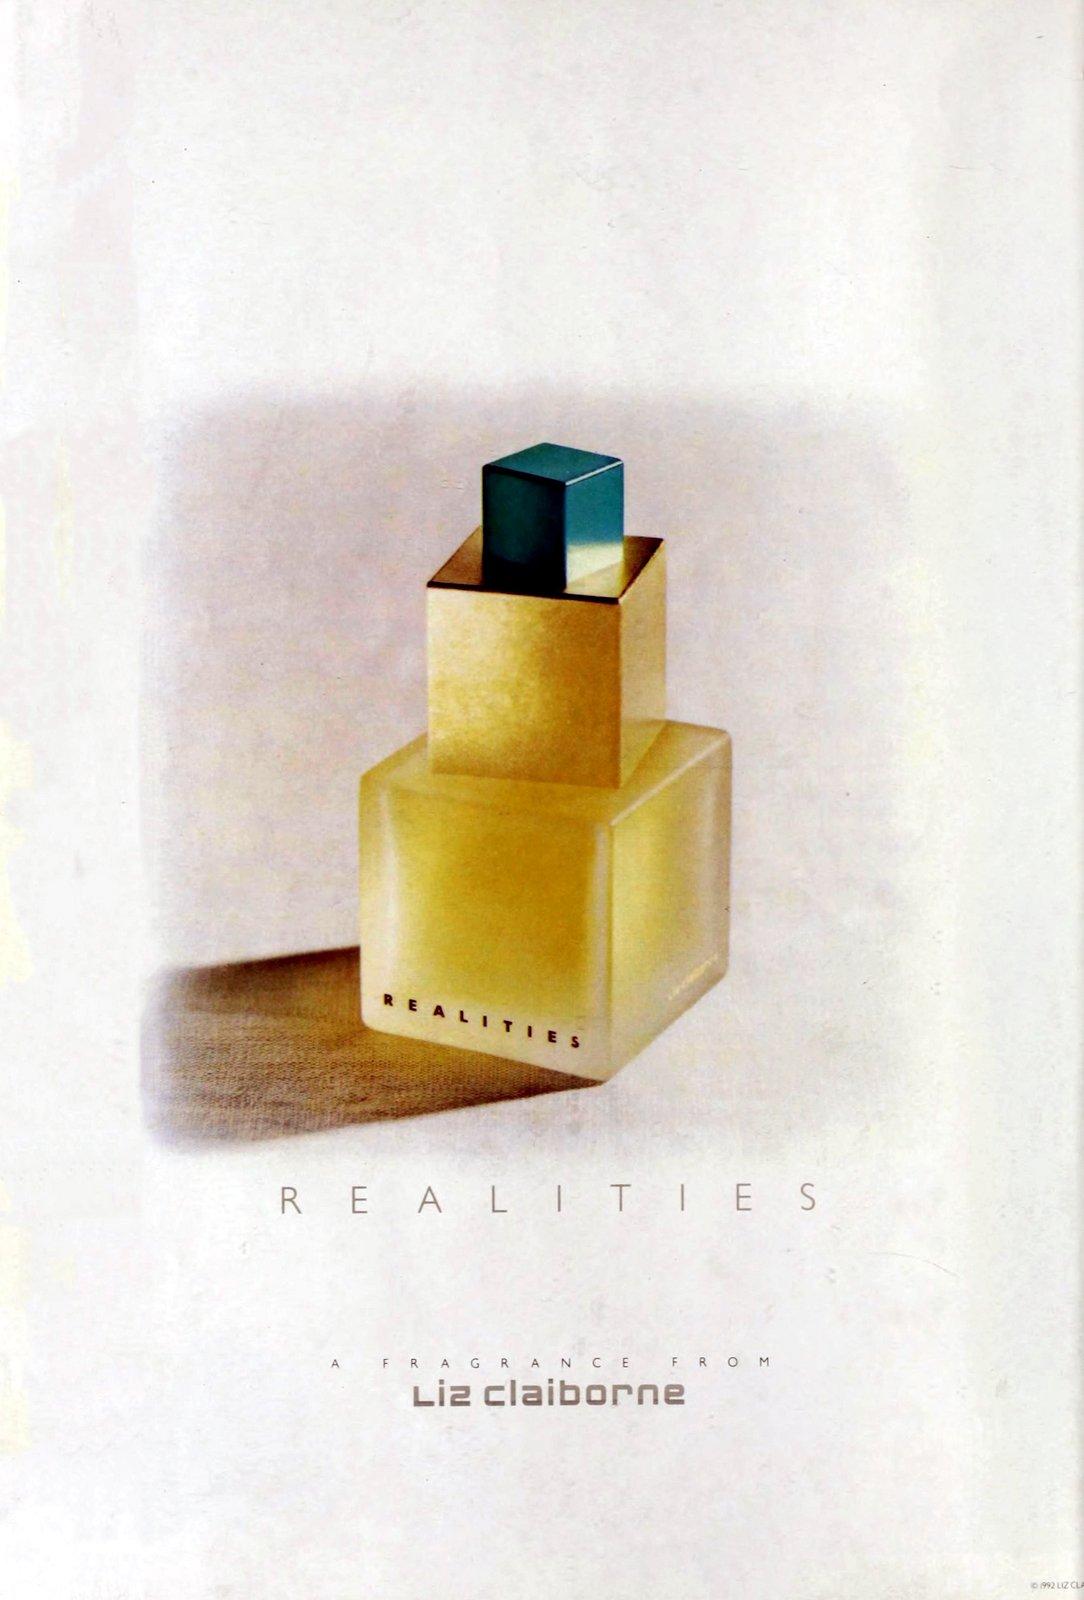 Realities vintage fragrance from Liz Claiborne (1993) at ClickAmericana.com